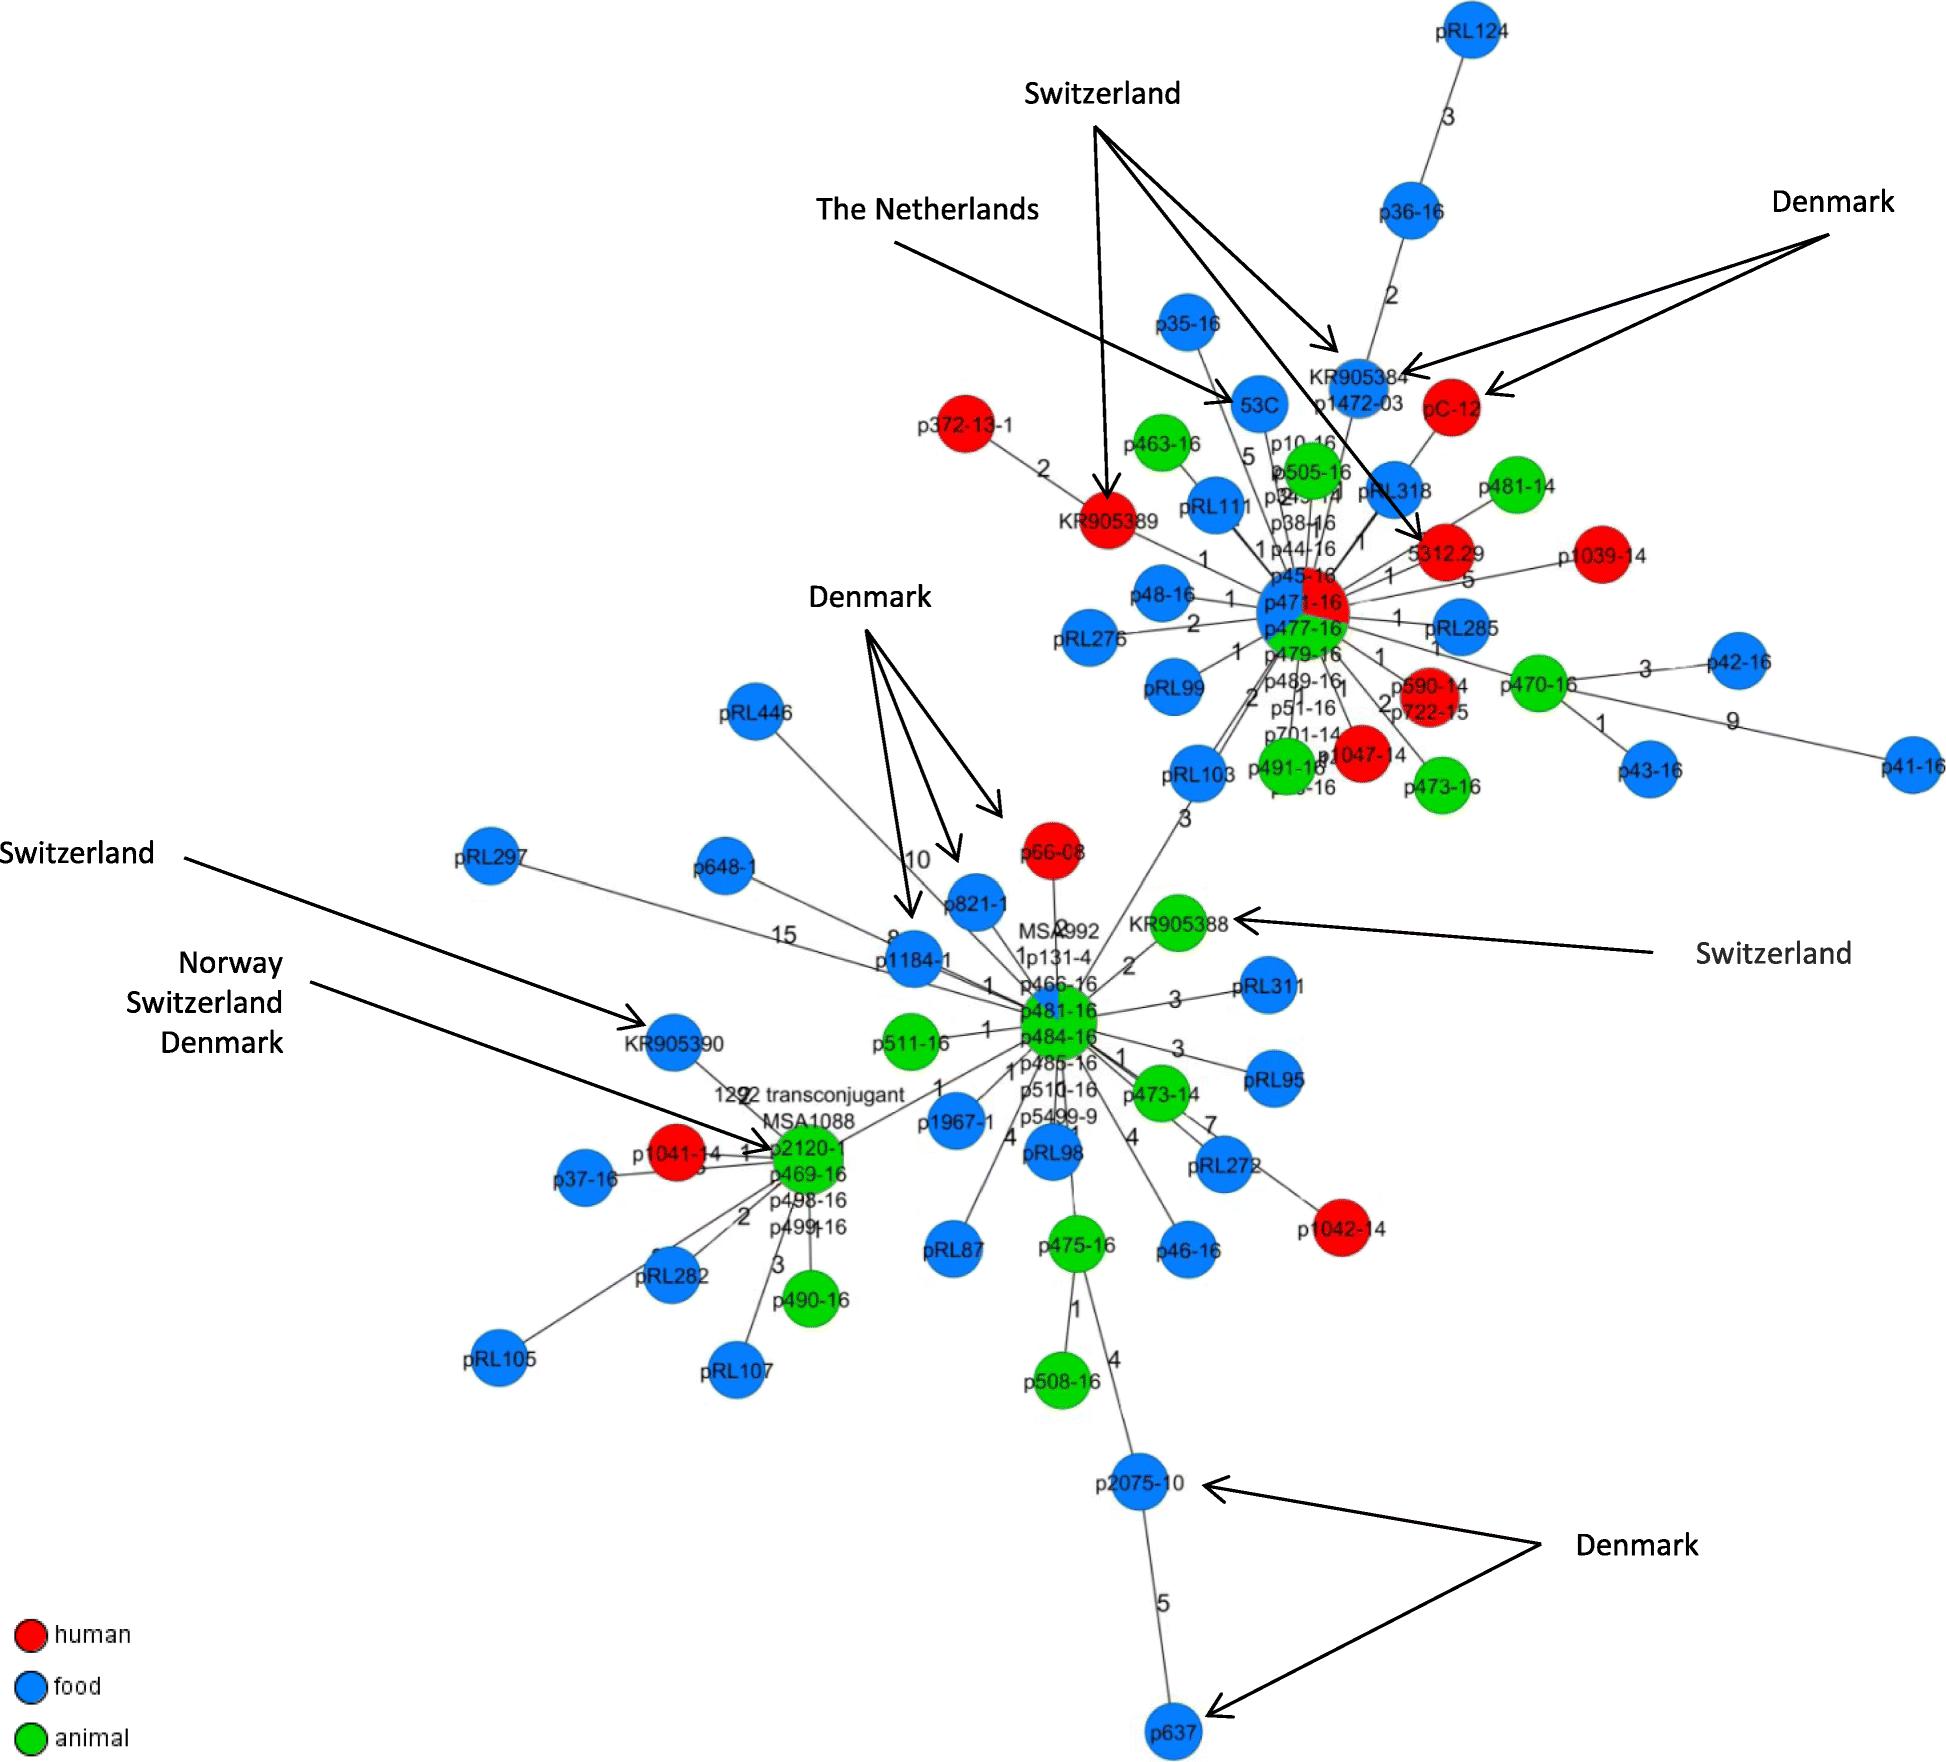 Whole genome analyses of CMY-2-producing Escherichia coli isolates ...